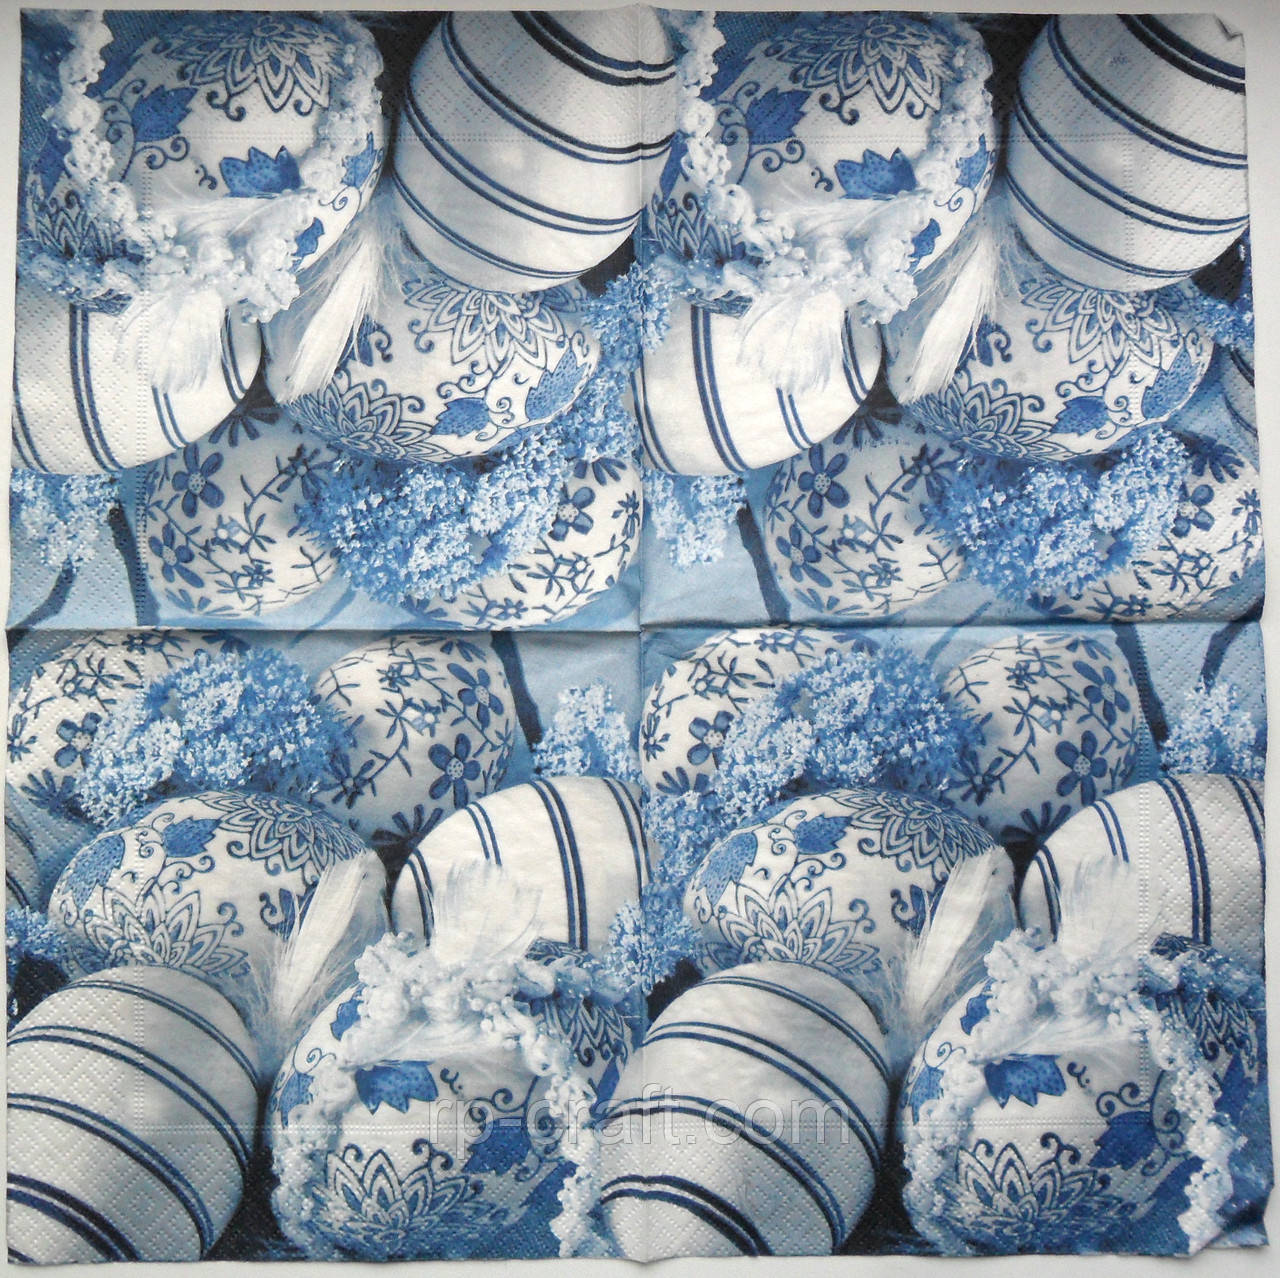 Серветка для декупажу. Яйця в блакитних тонах, 33х33 см